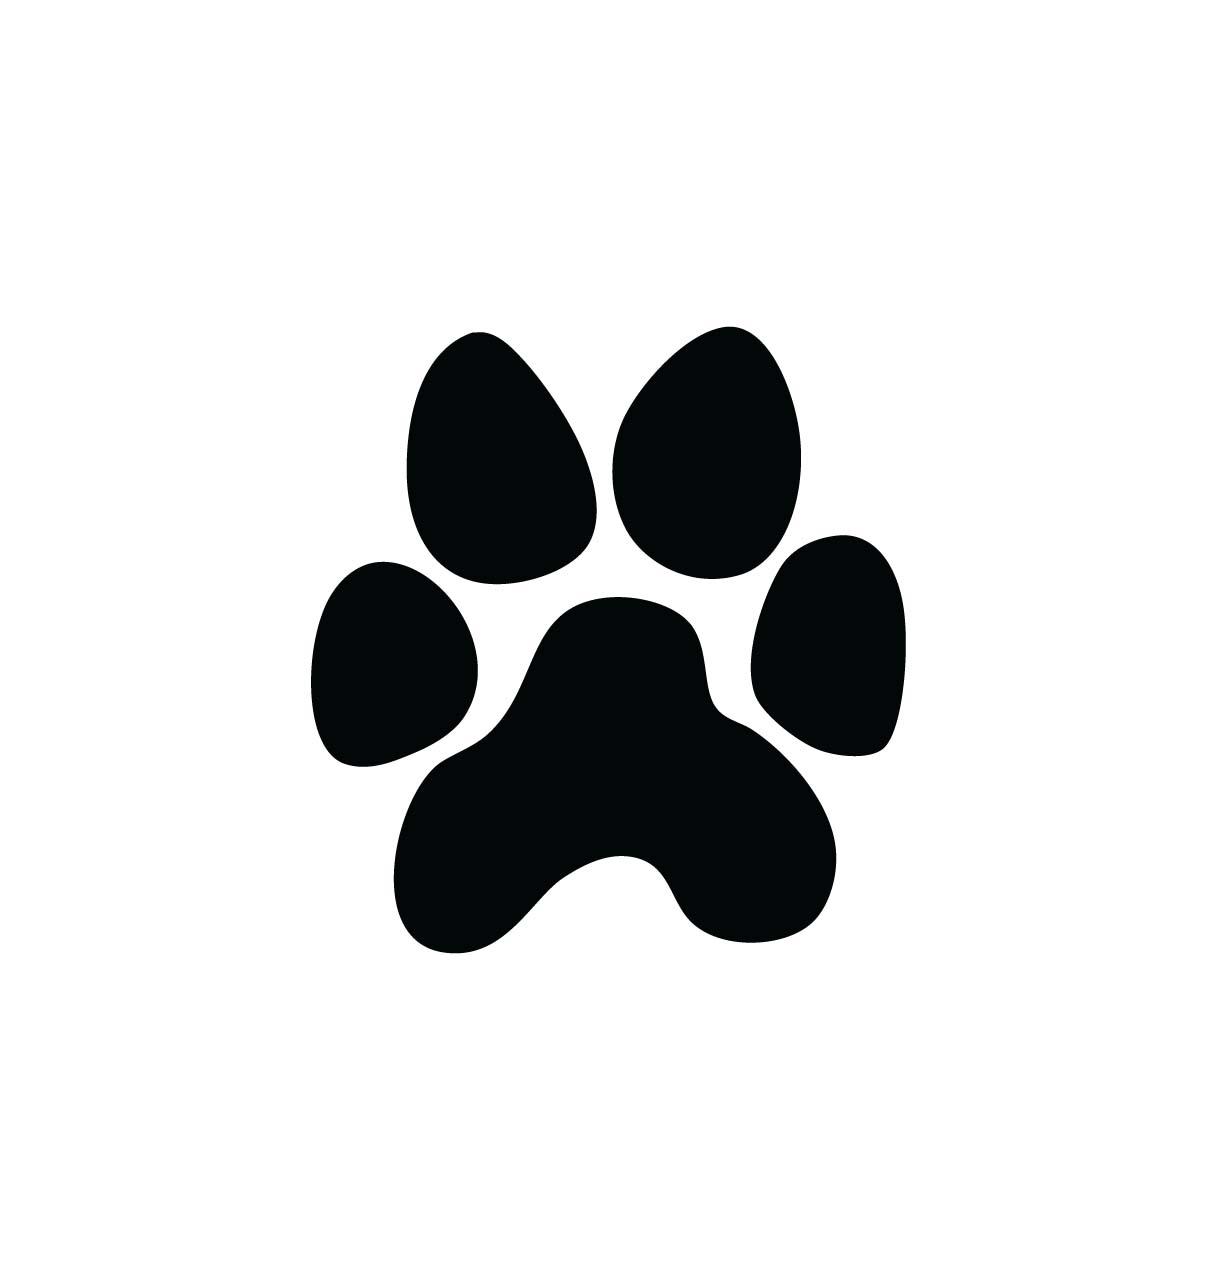 1214x1282 Paw Print Tattoos On Dog Paw Prints Scroll Clipart 3 8 2